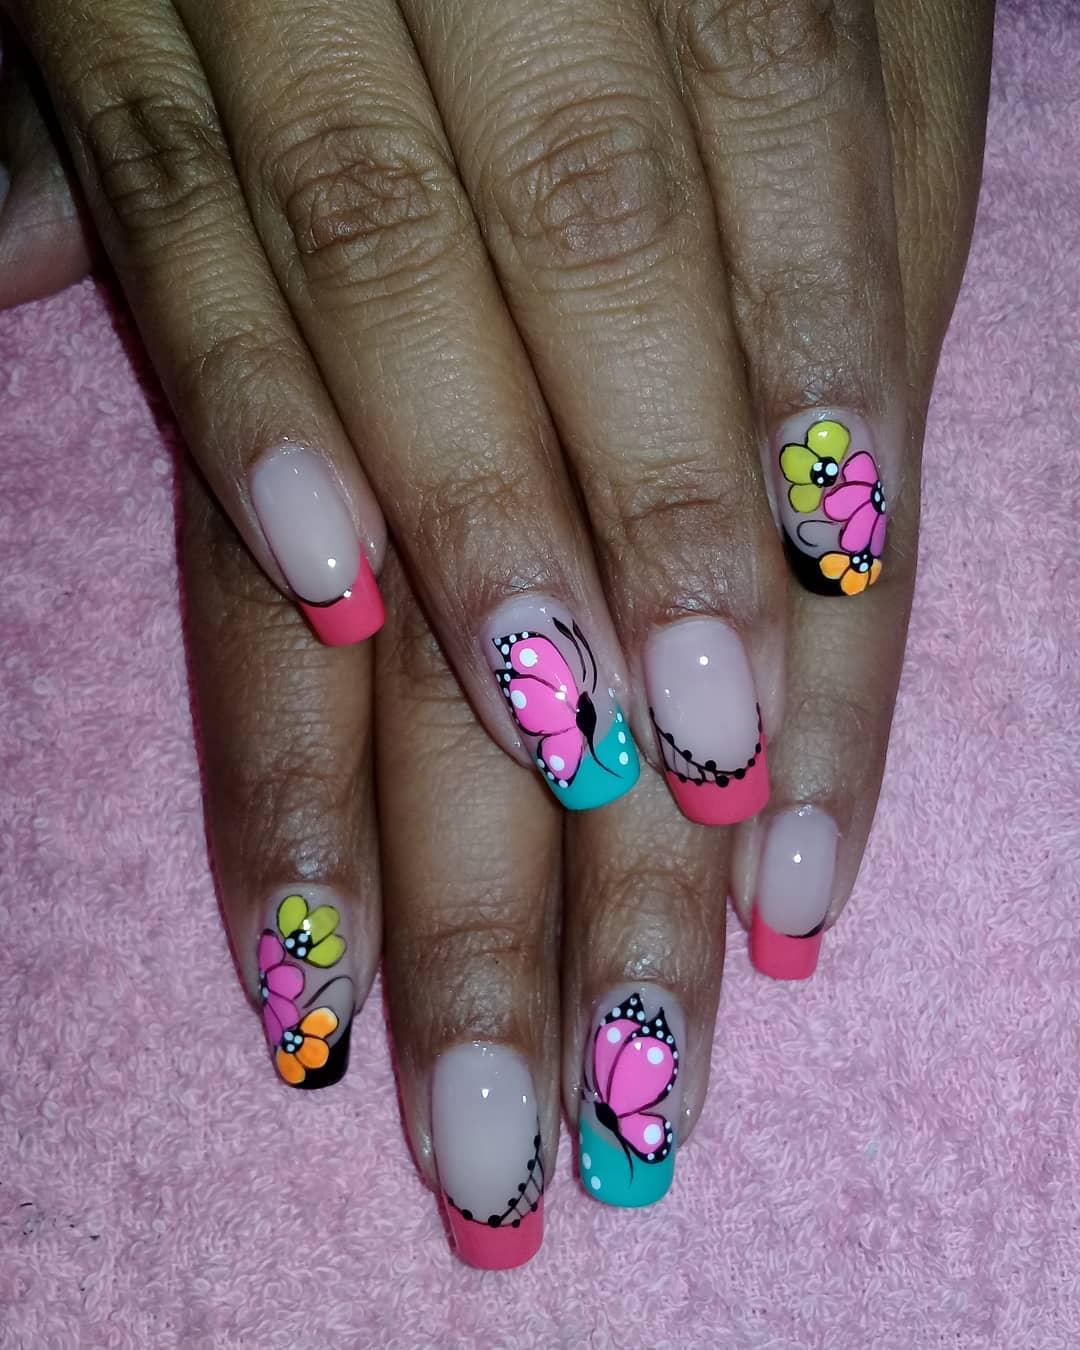 Magic nails spa #magicnailsspa #nails #nailsart # magiaentusuñas # decoracion ...